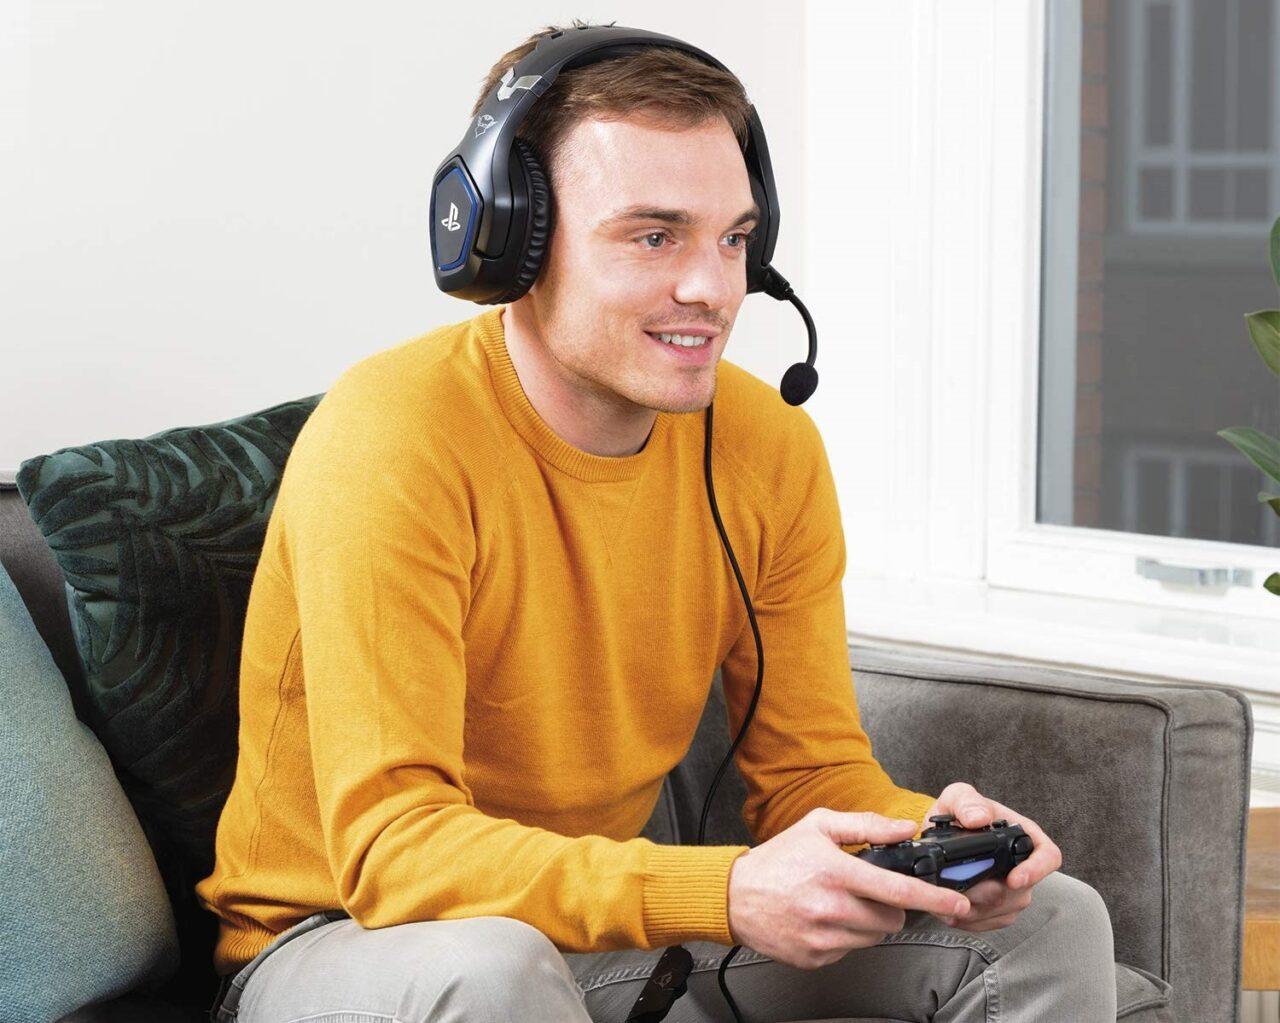 Trust Gaming GXT 488 in SCONTO a 31€: cuffie per PS4 e PS5 a basso costo